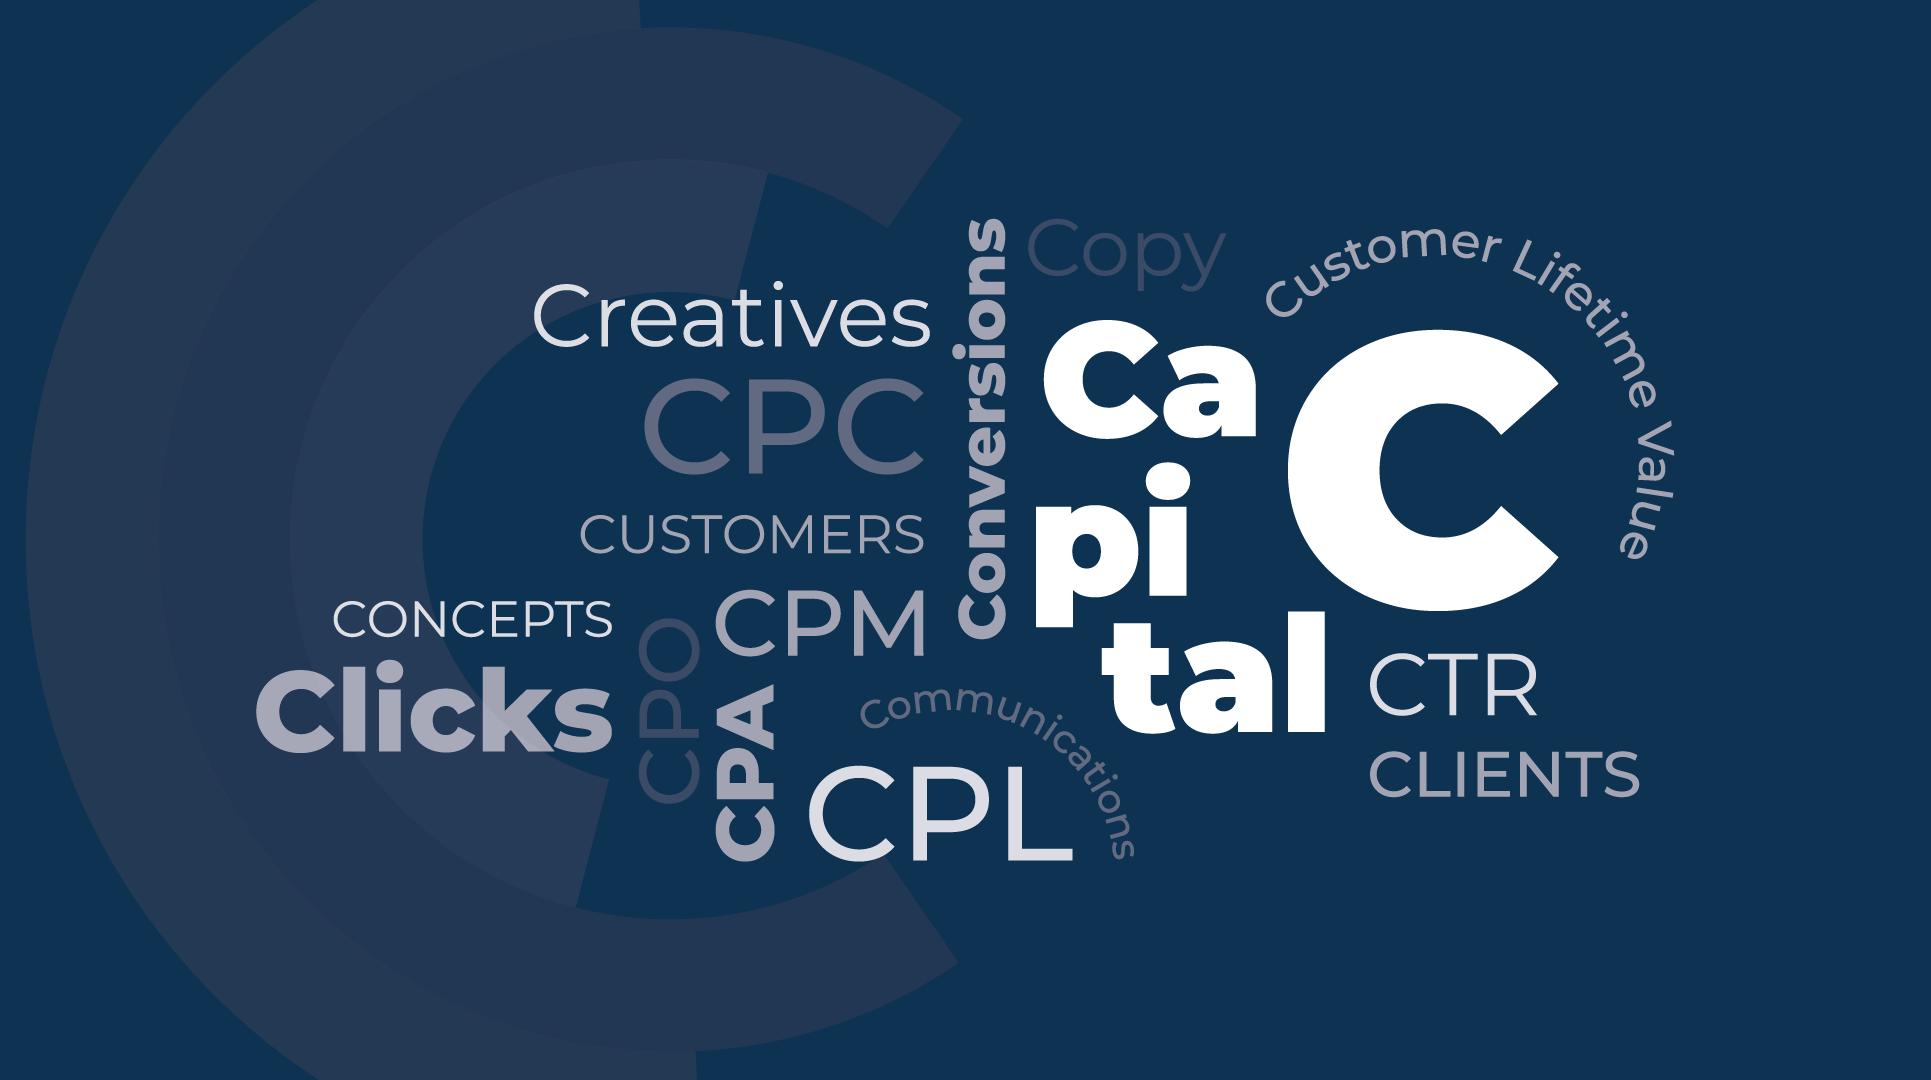 Capital CW